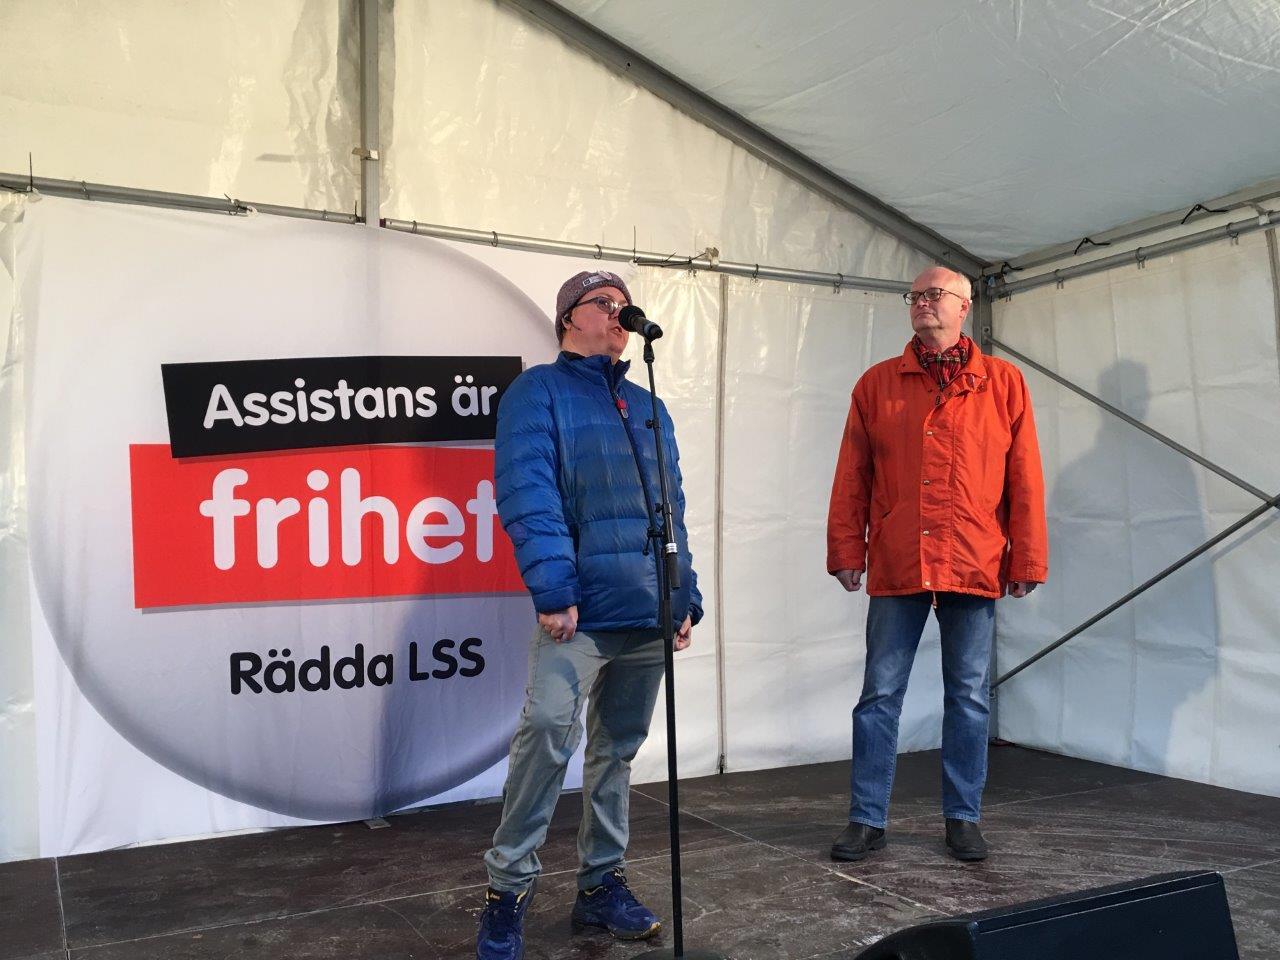 LSS-manifestation Stockholm 2017: Krister Ekberg och Thomas Jansson talar